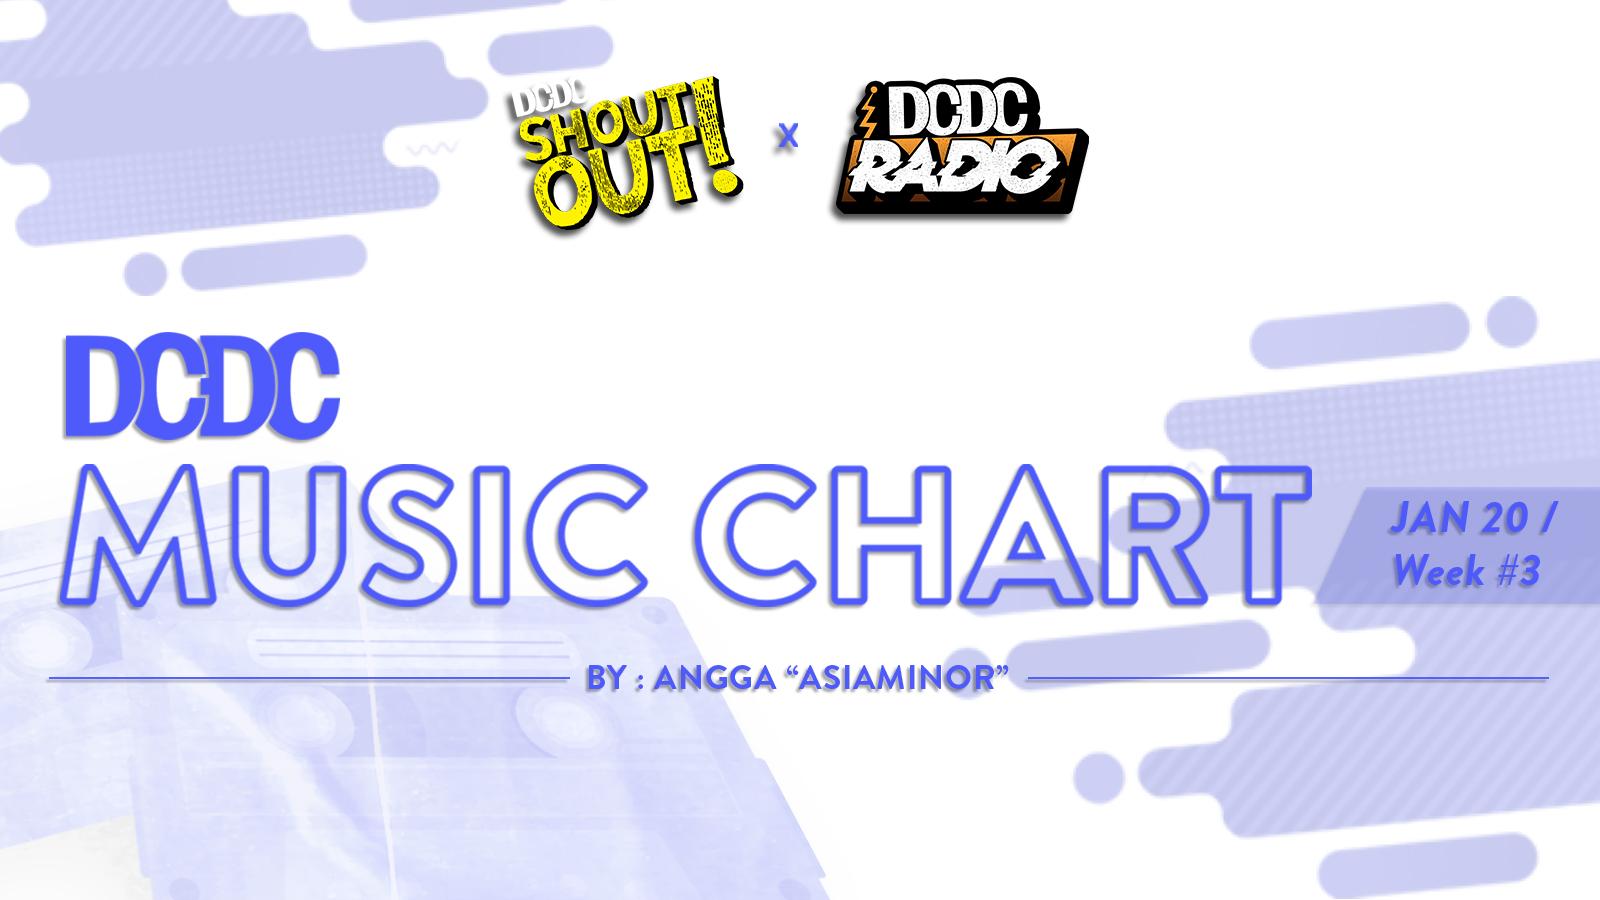 DCDC Music Chart - #3rd Week of Januari 2019